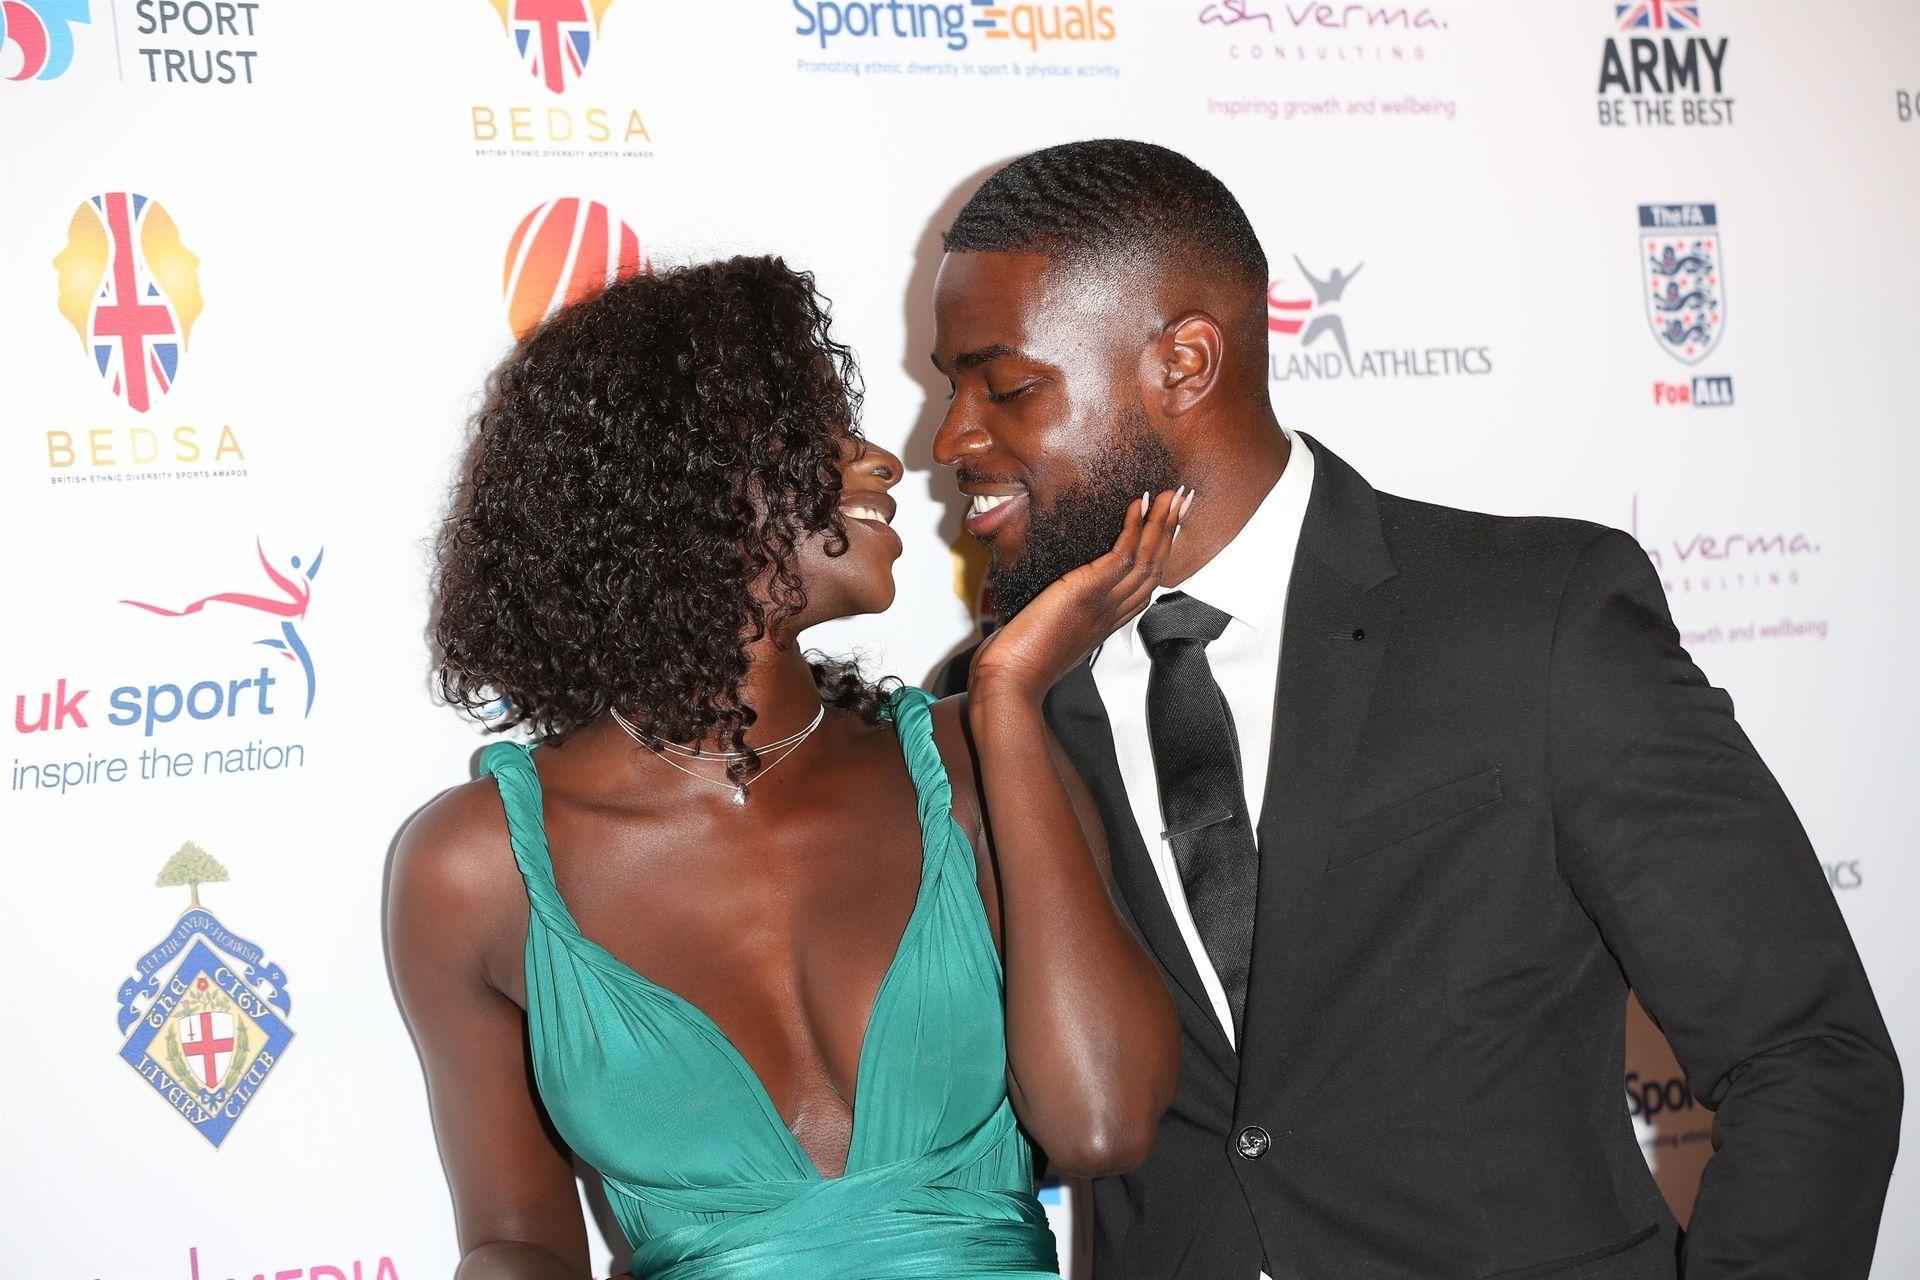 Mike Boateng & Priscilla Anyabu Are Seen At British Ethnic Diversity Sports Awards 0065